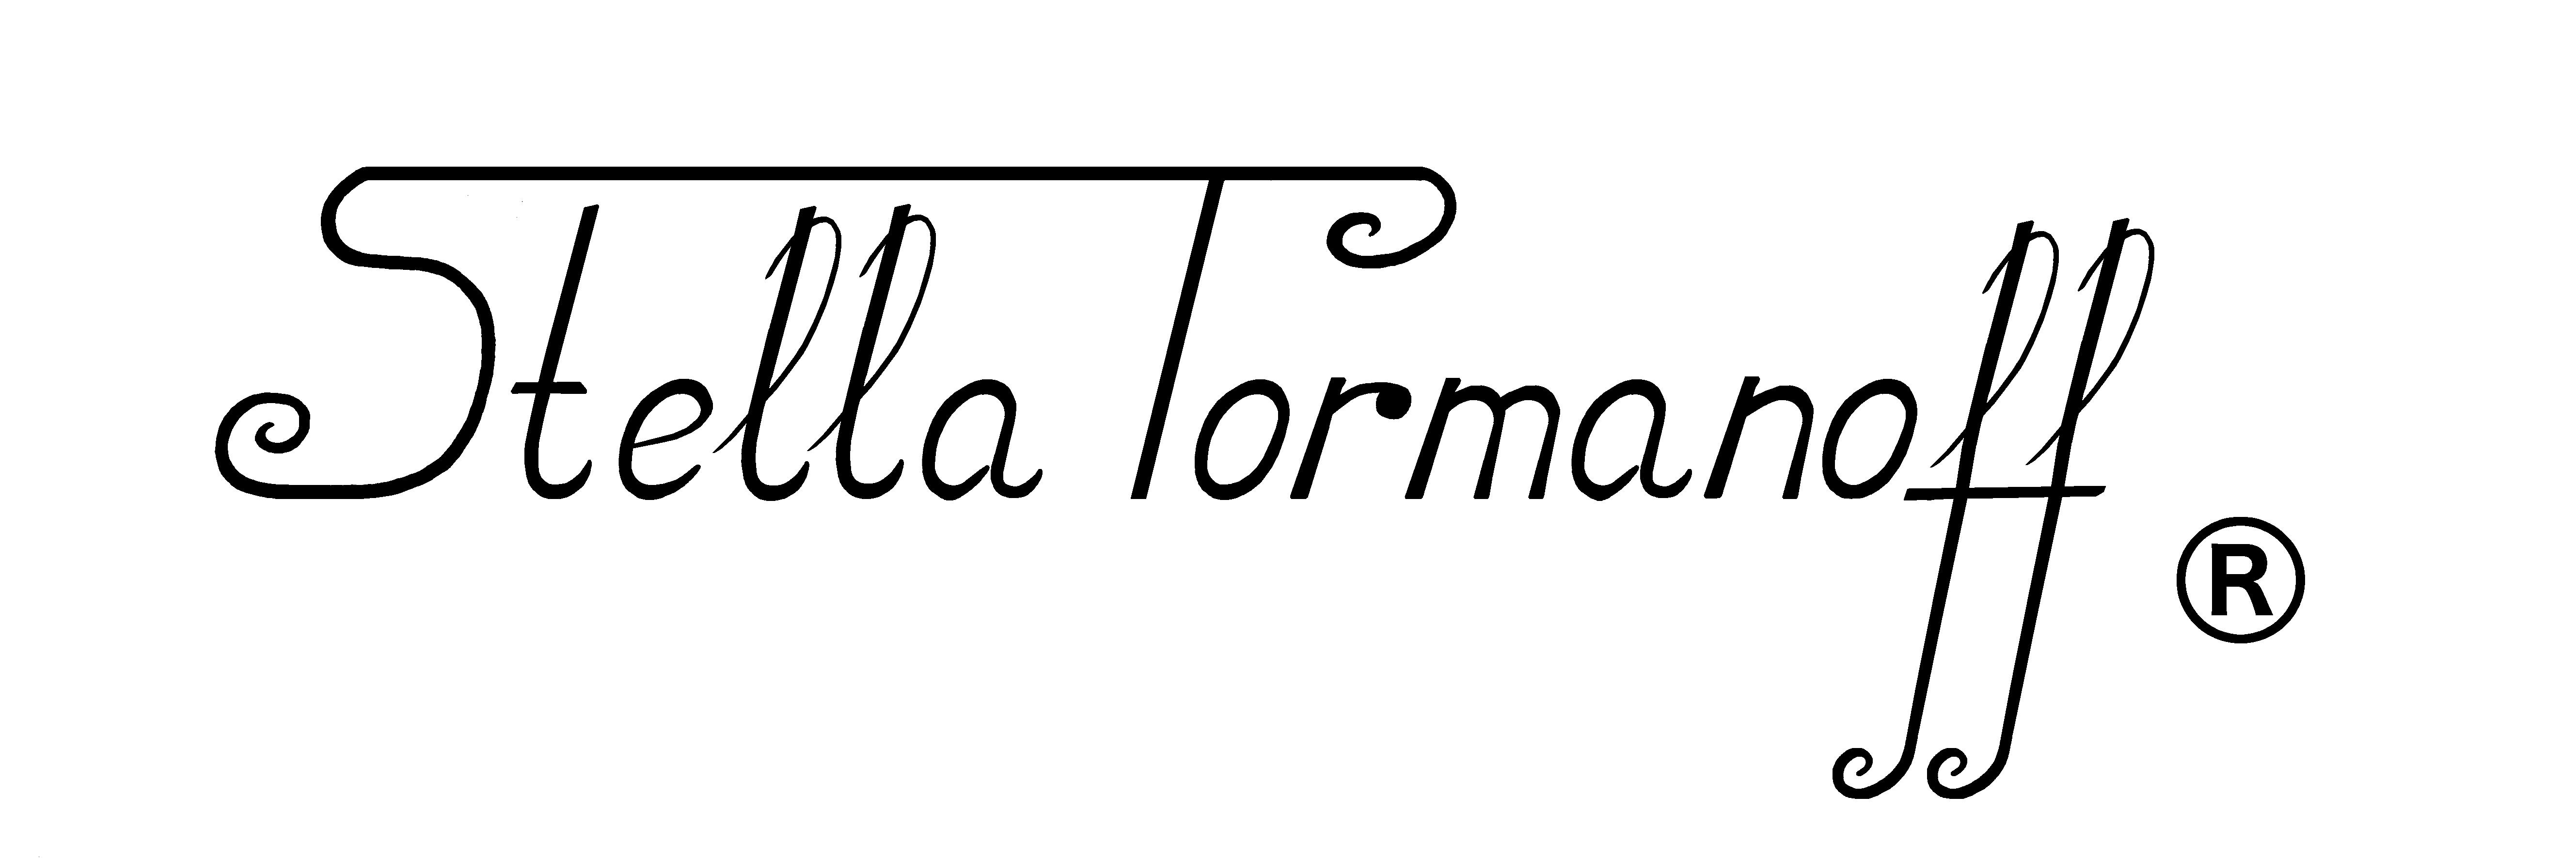 Stella Tormanoff logo